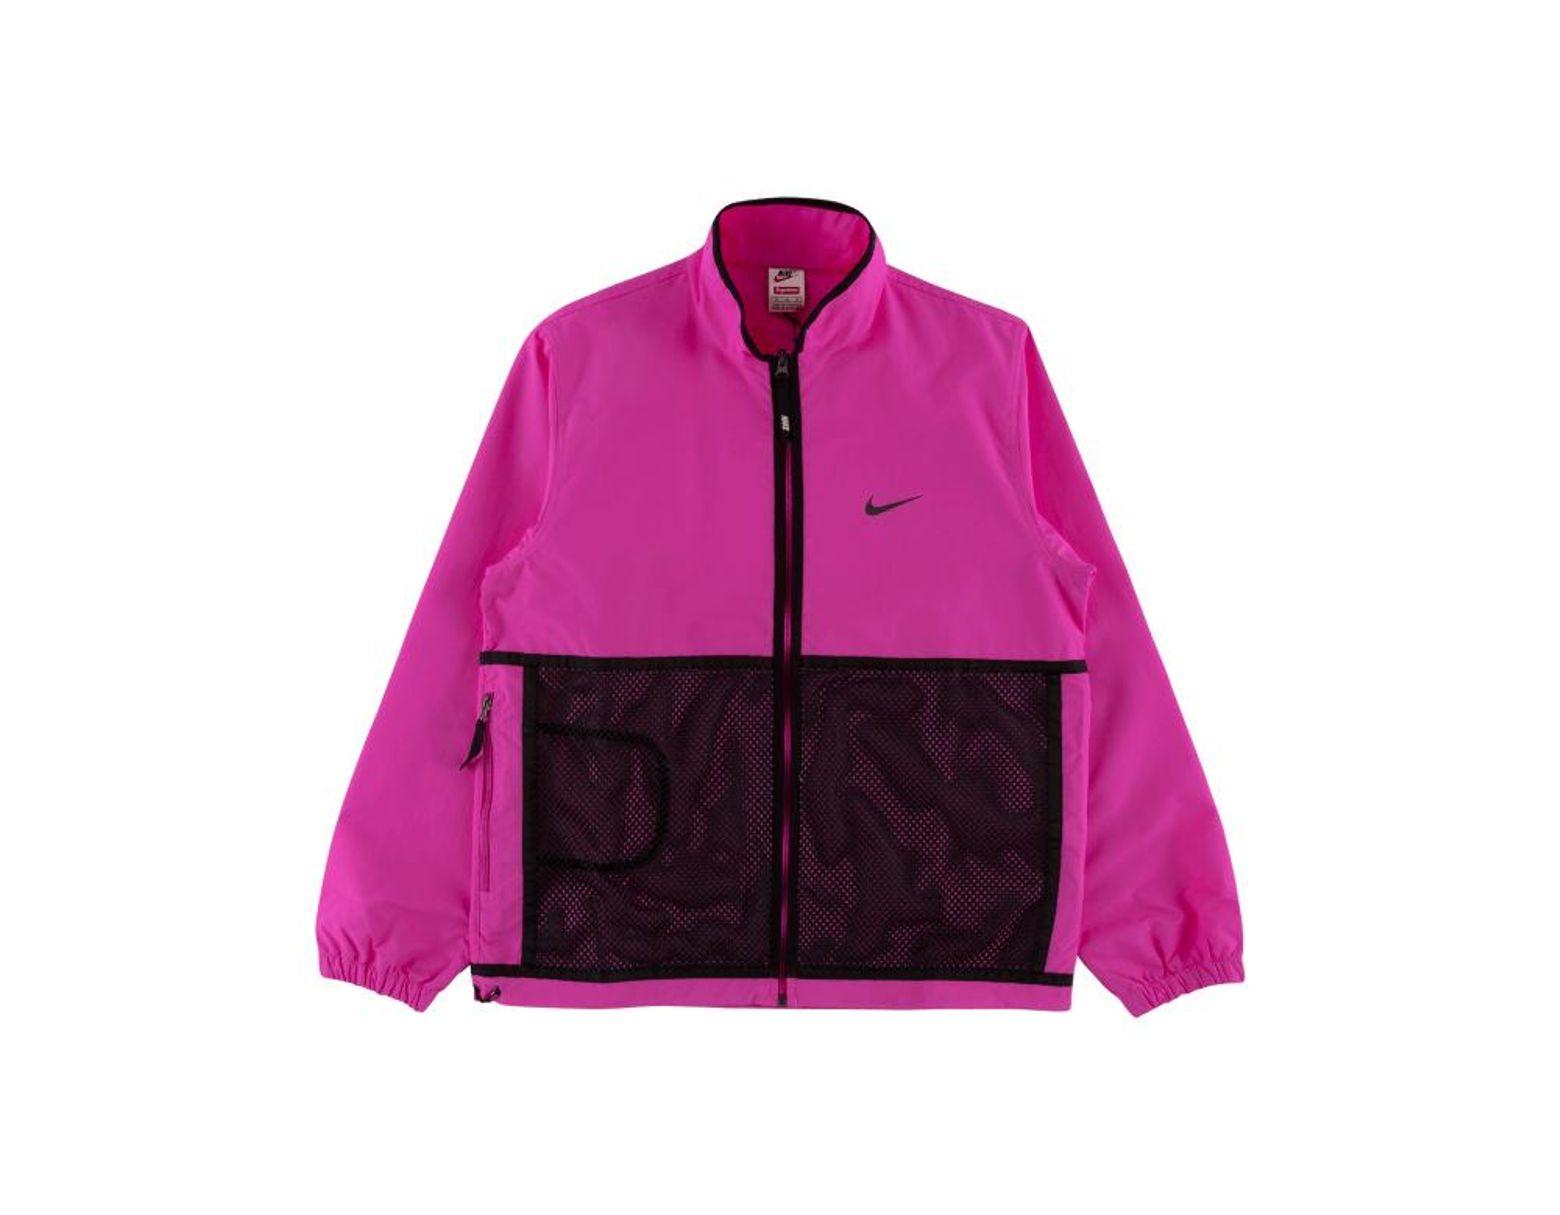 faf98cb1 Supreme Nike Trail Running Jacket in Pink for Men - Lyst